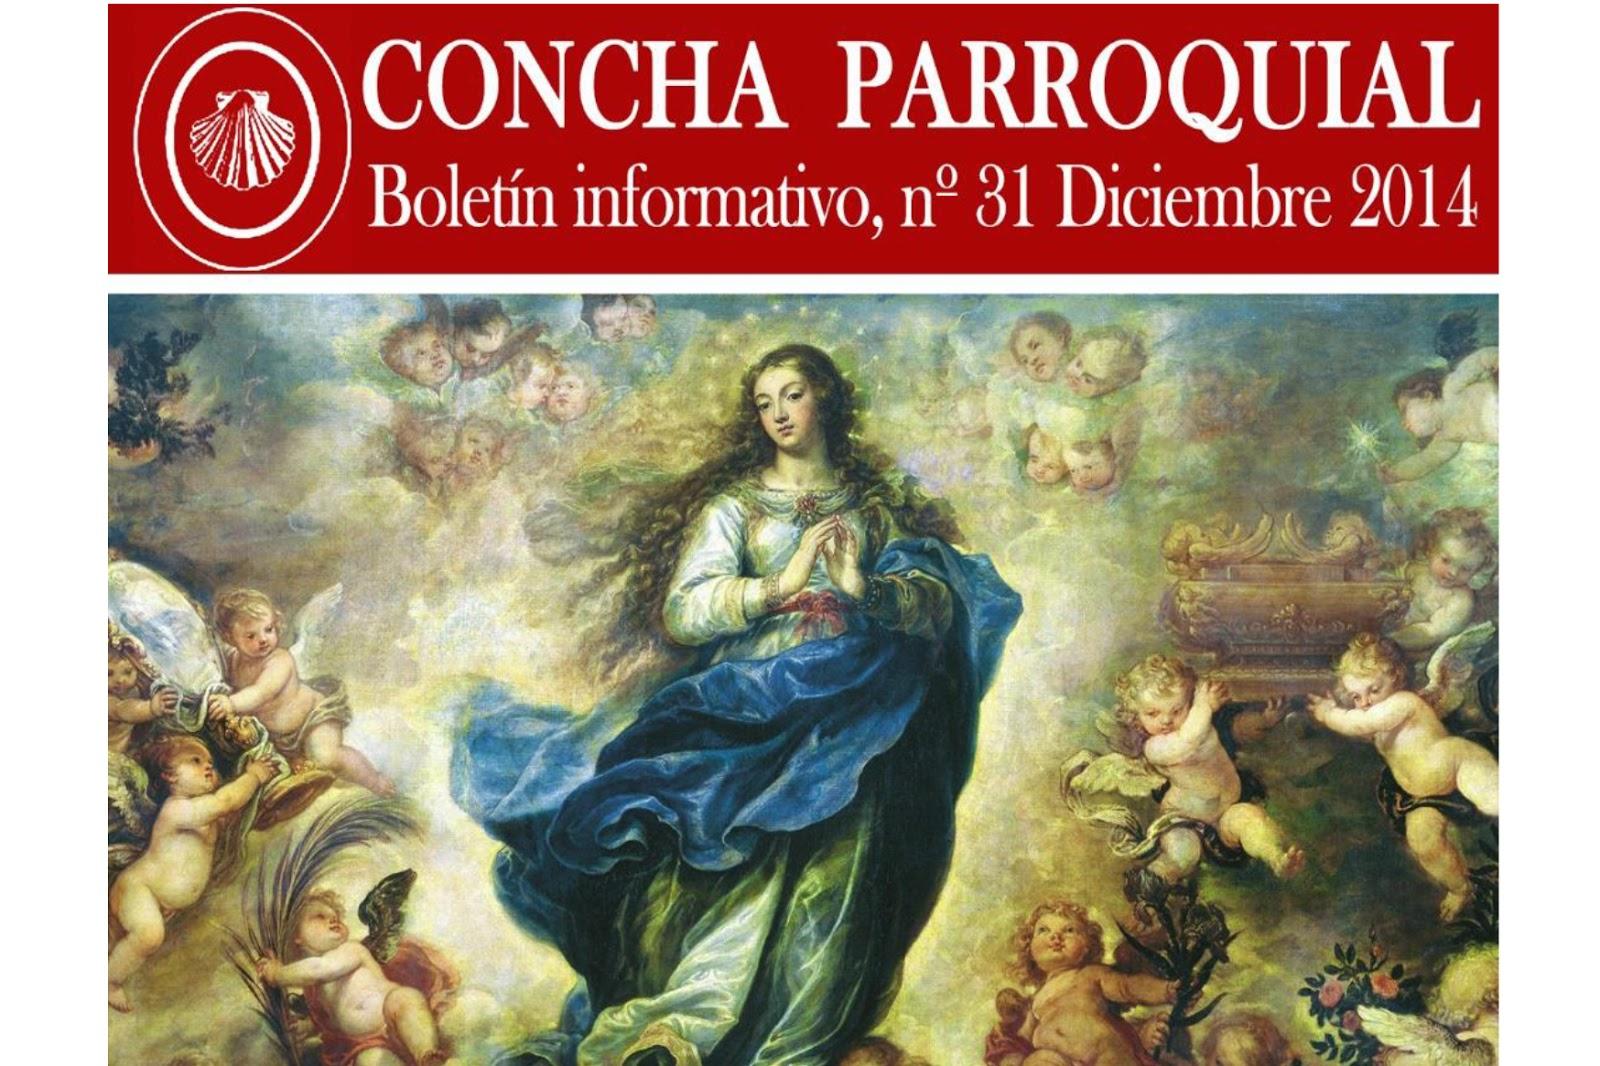 http://www.cofradiadelaconcha.com/boletines/2014/Diciembre2014.pdf